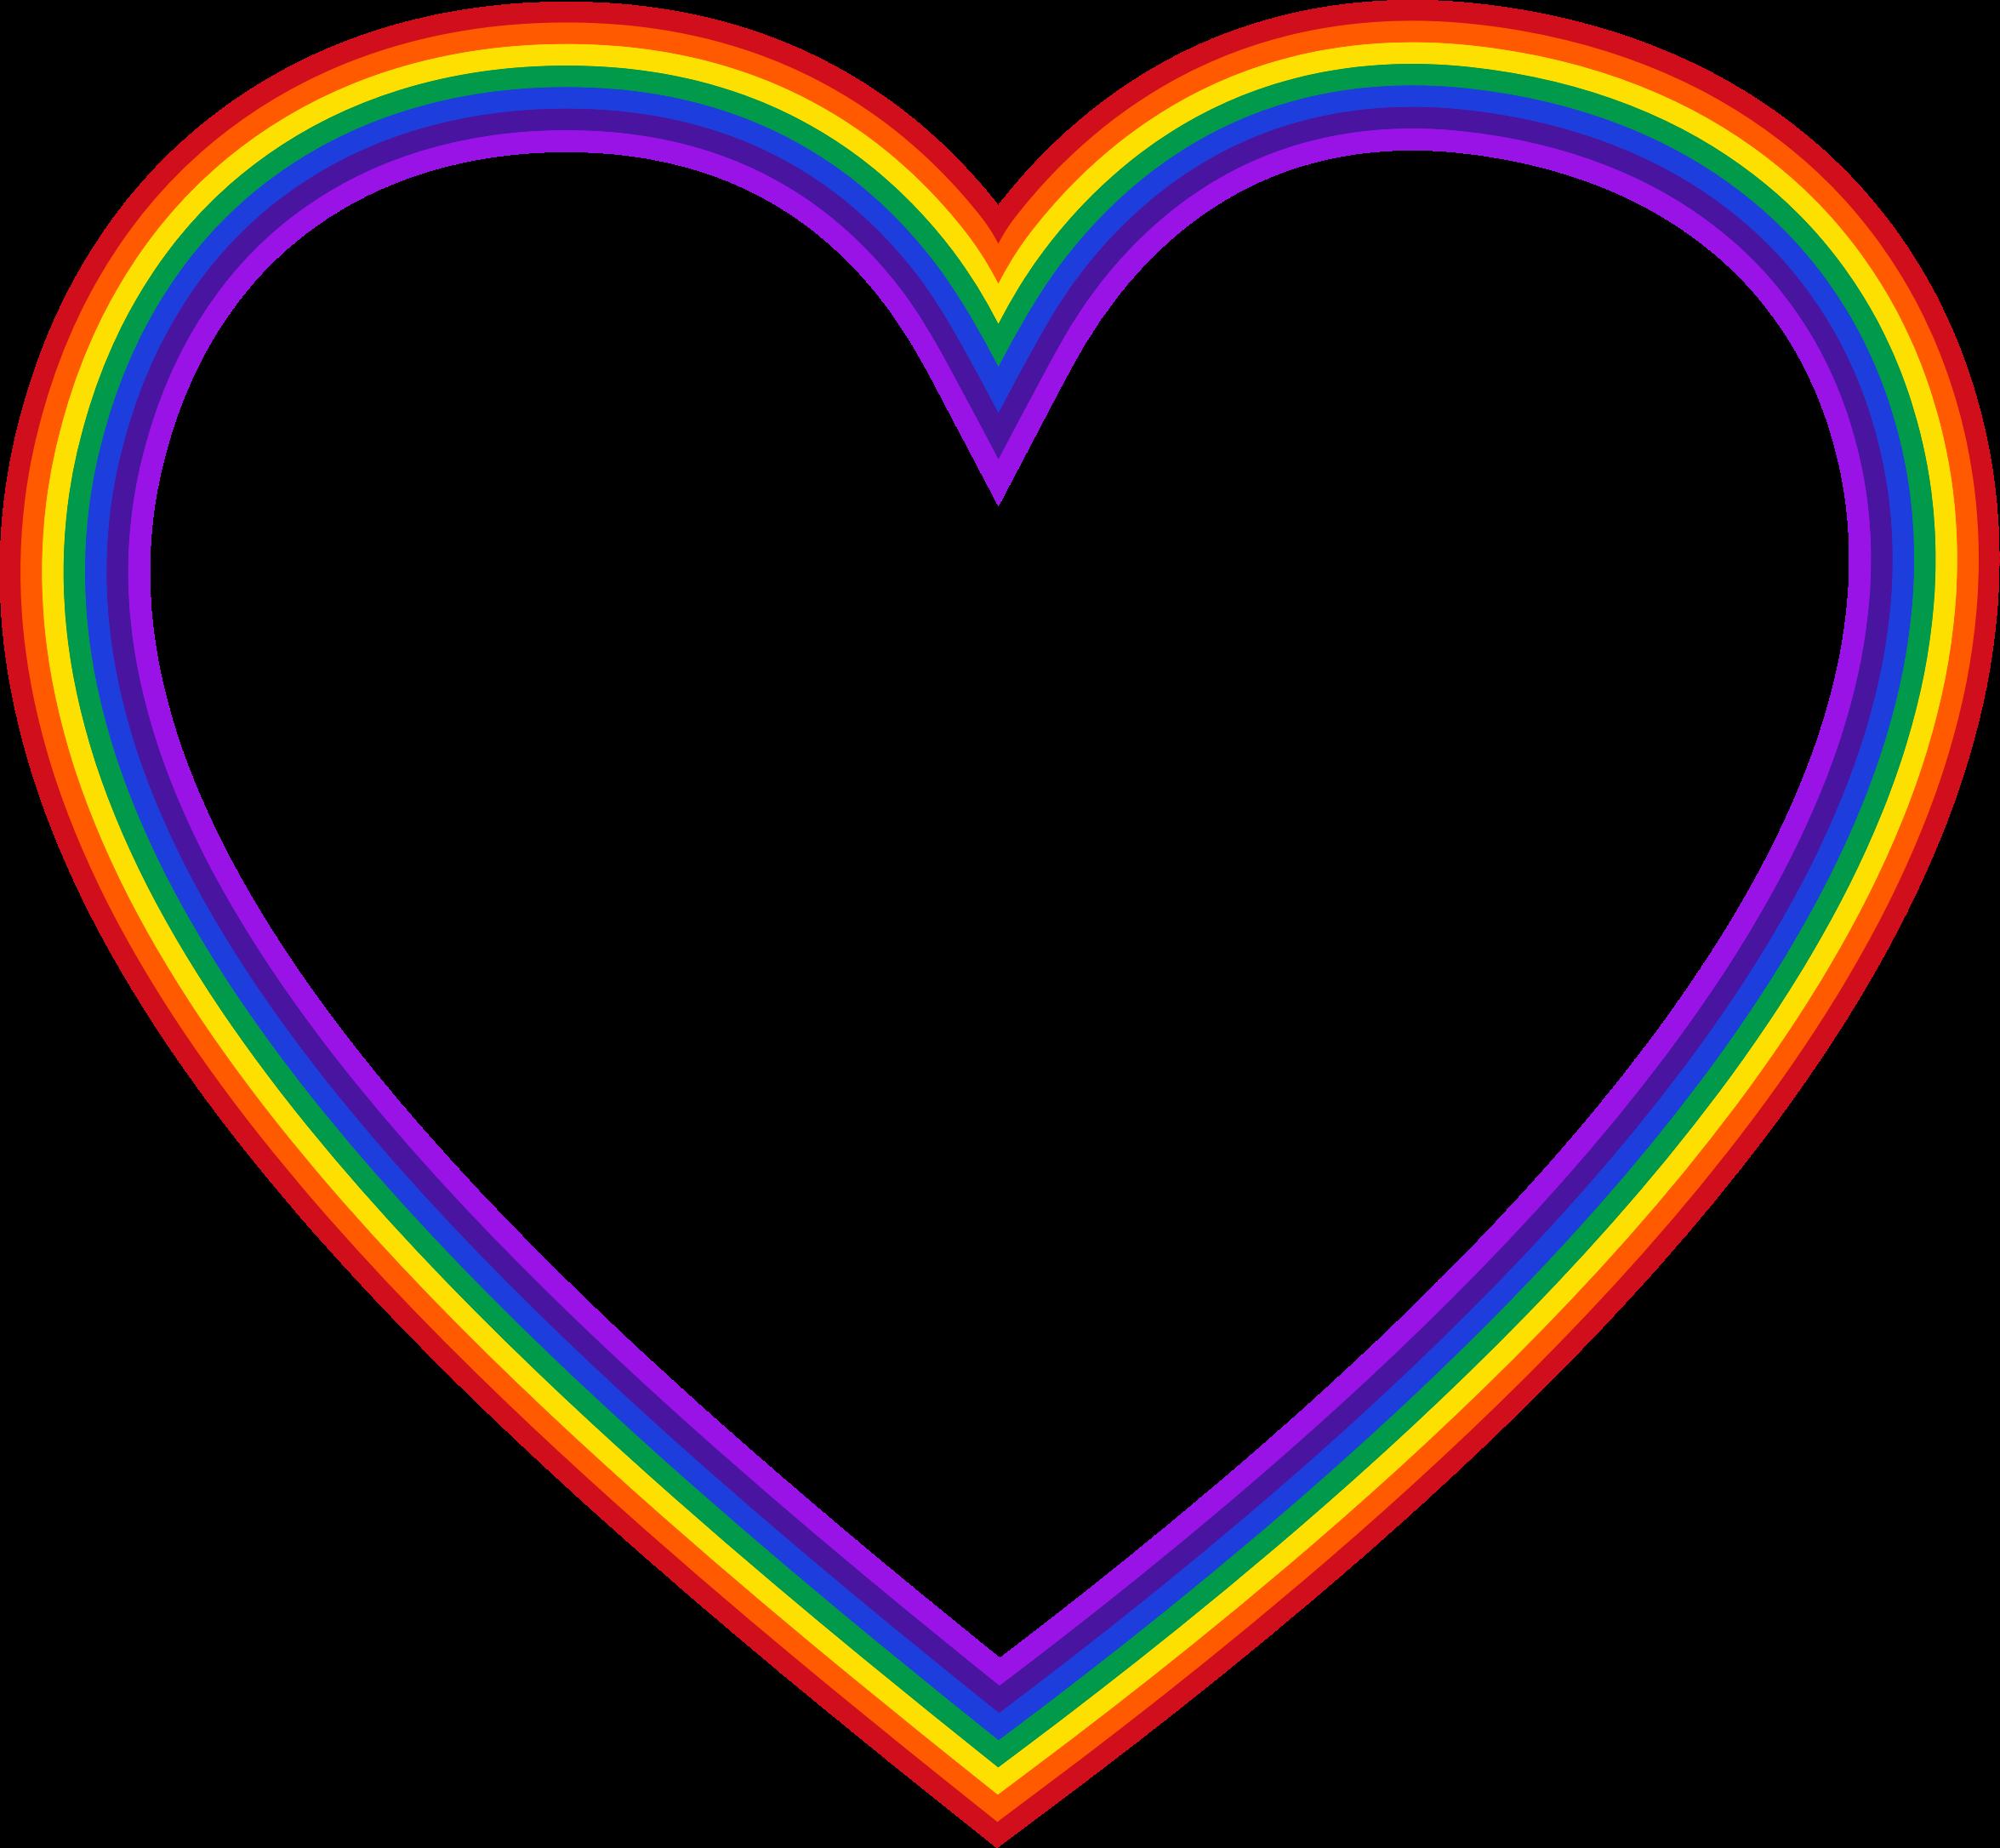 Heart clip art clipart. Rainbow hearts png